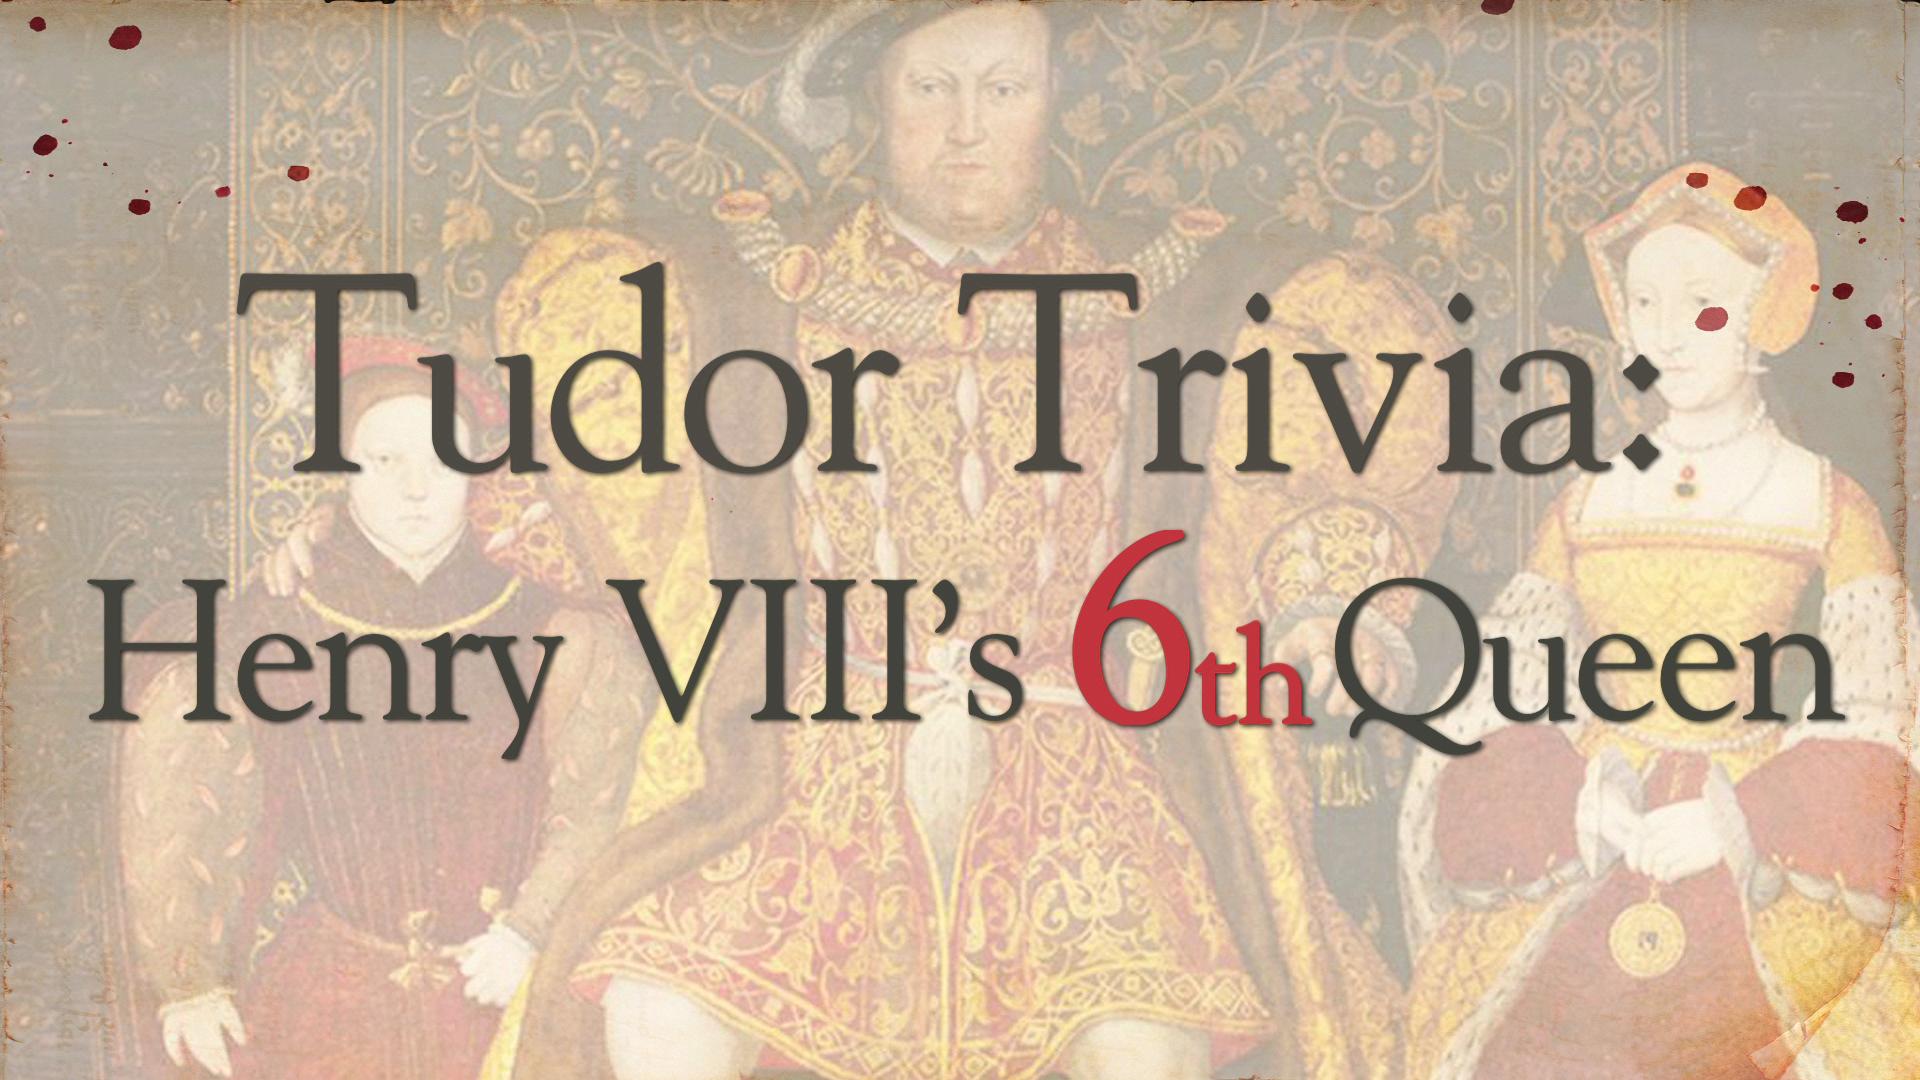 Tudor Trivia